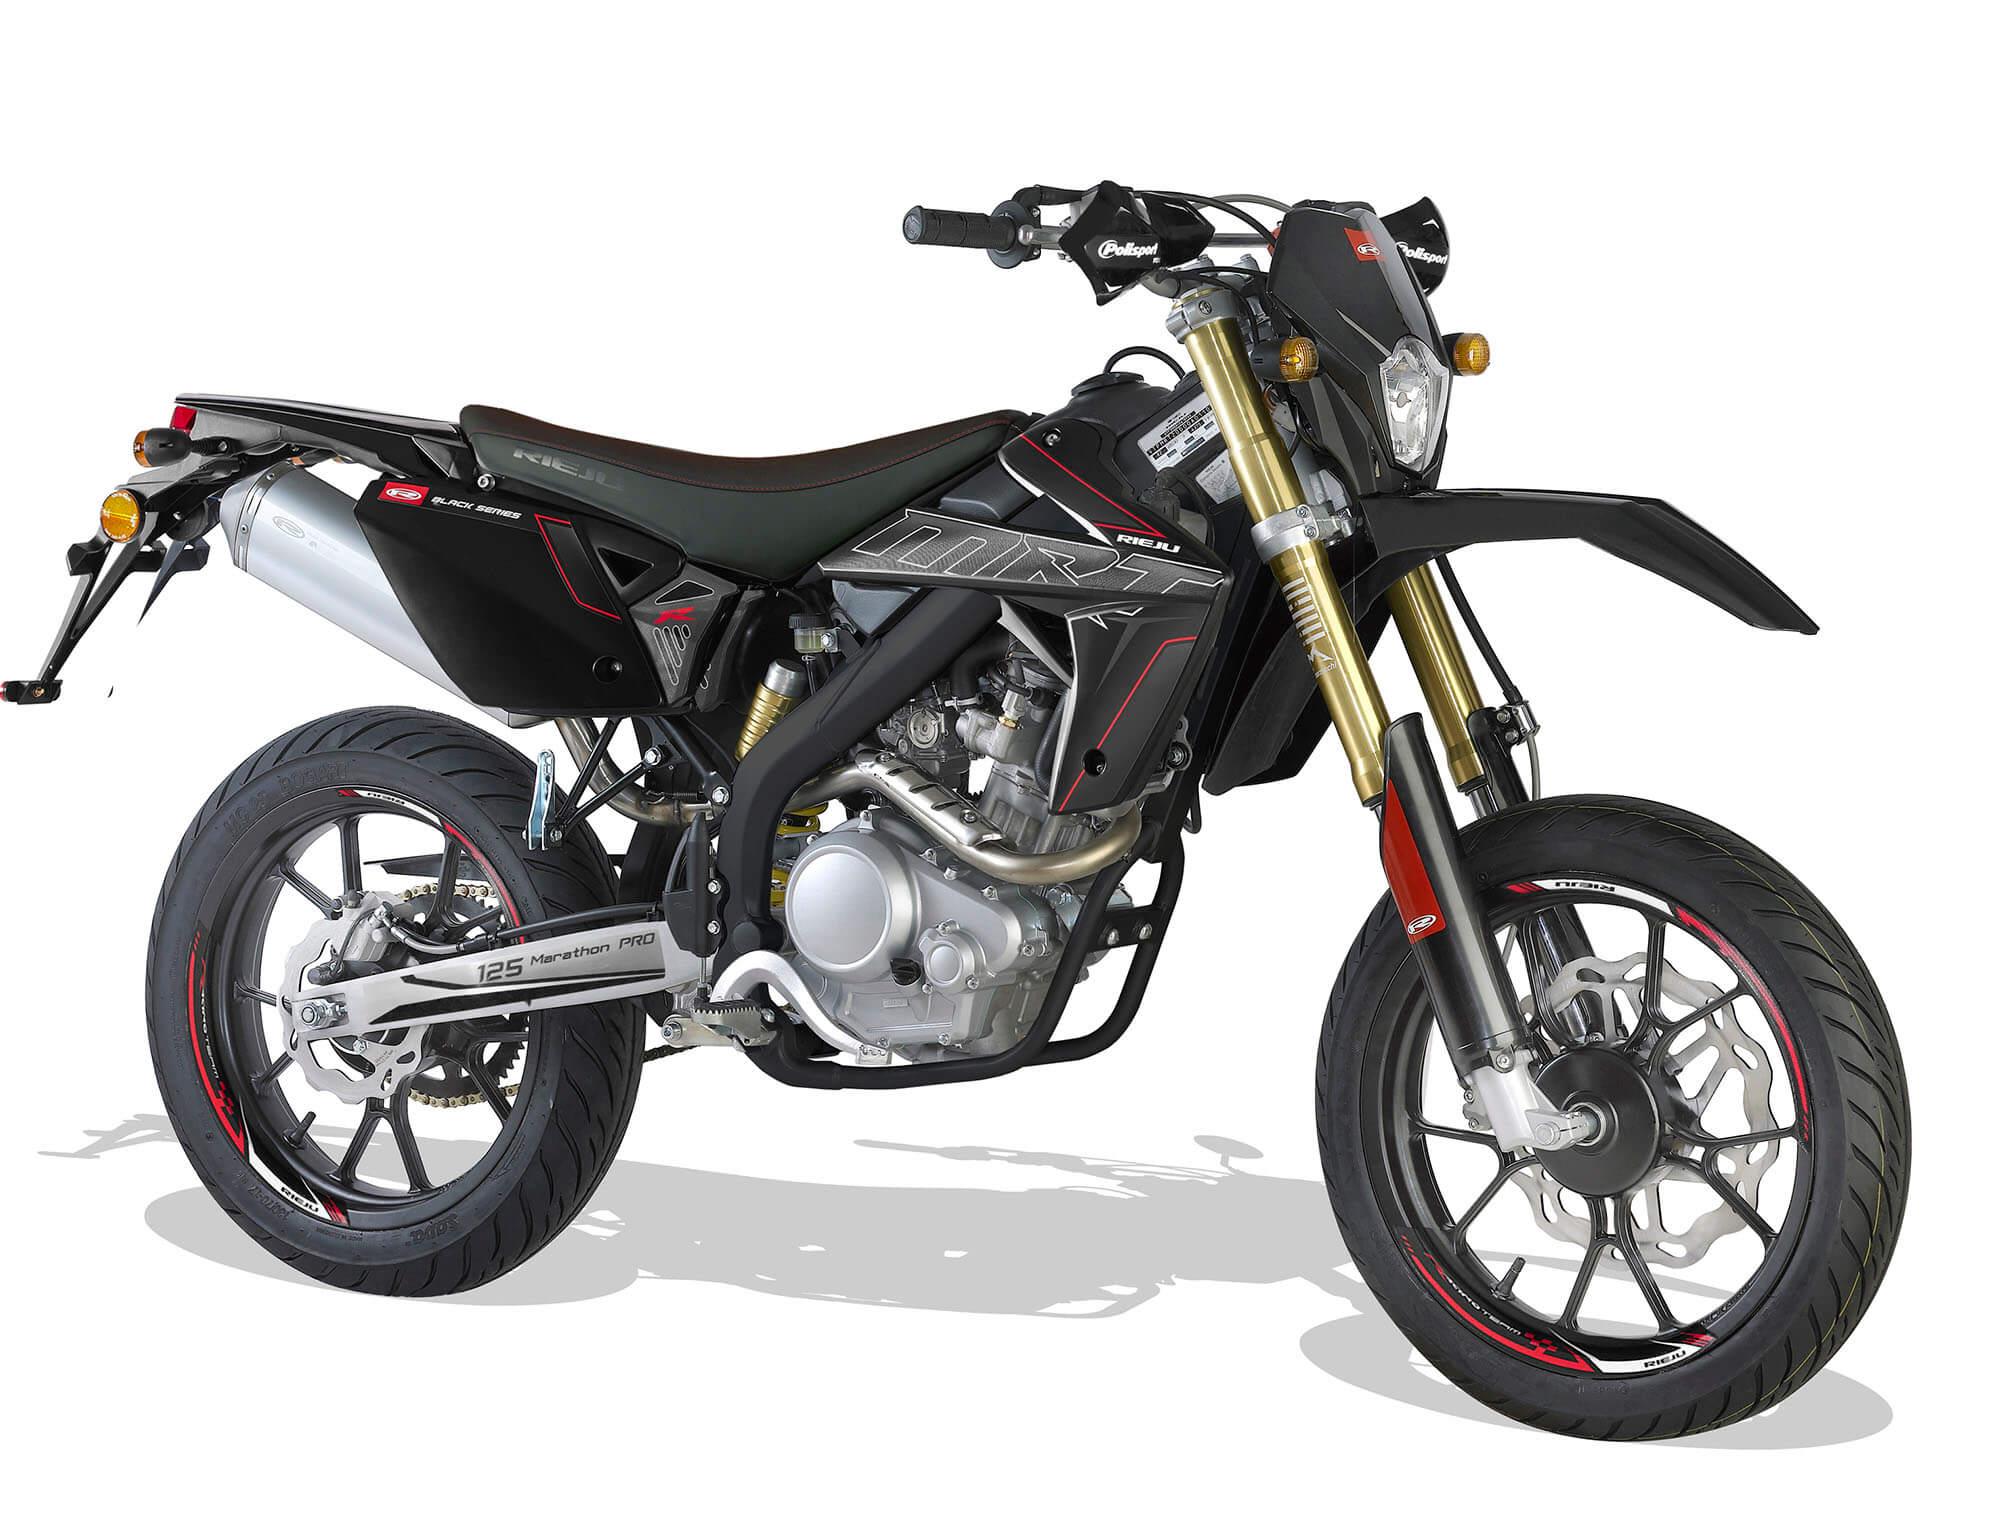 comprar-motos-rieju-marathon-pro-supermotard-125-negro-motissimo-barcelona